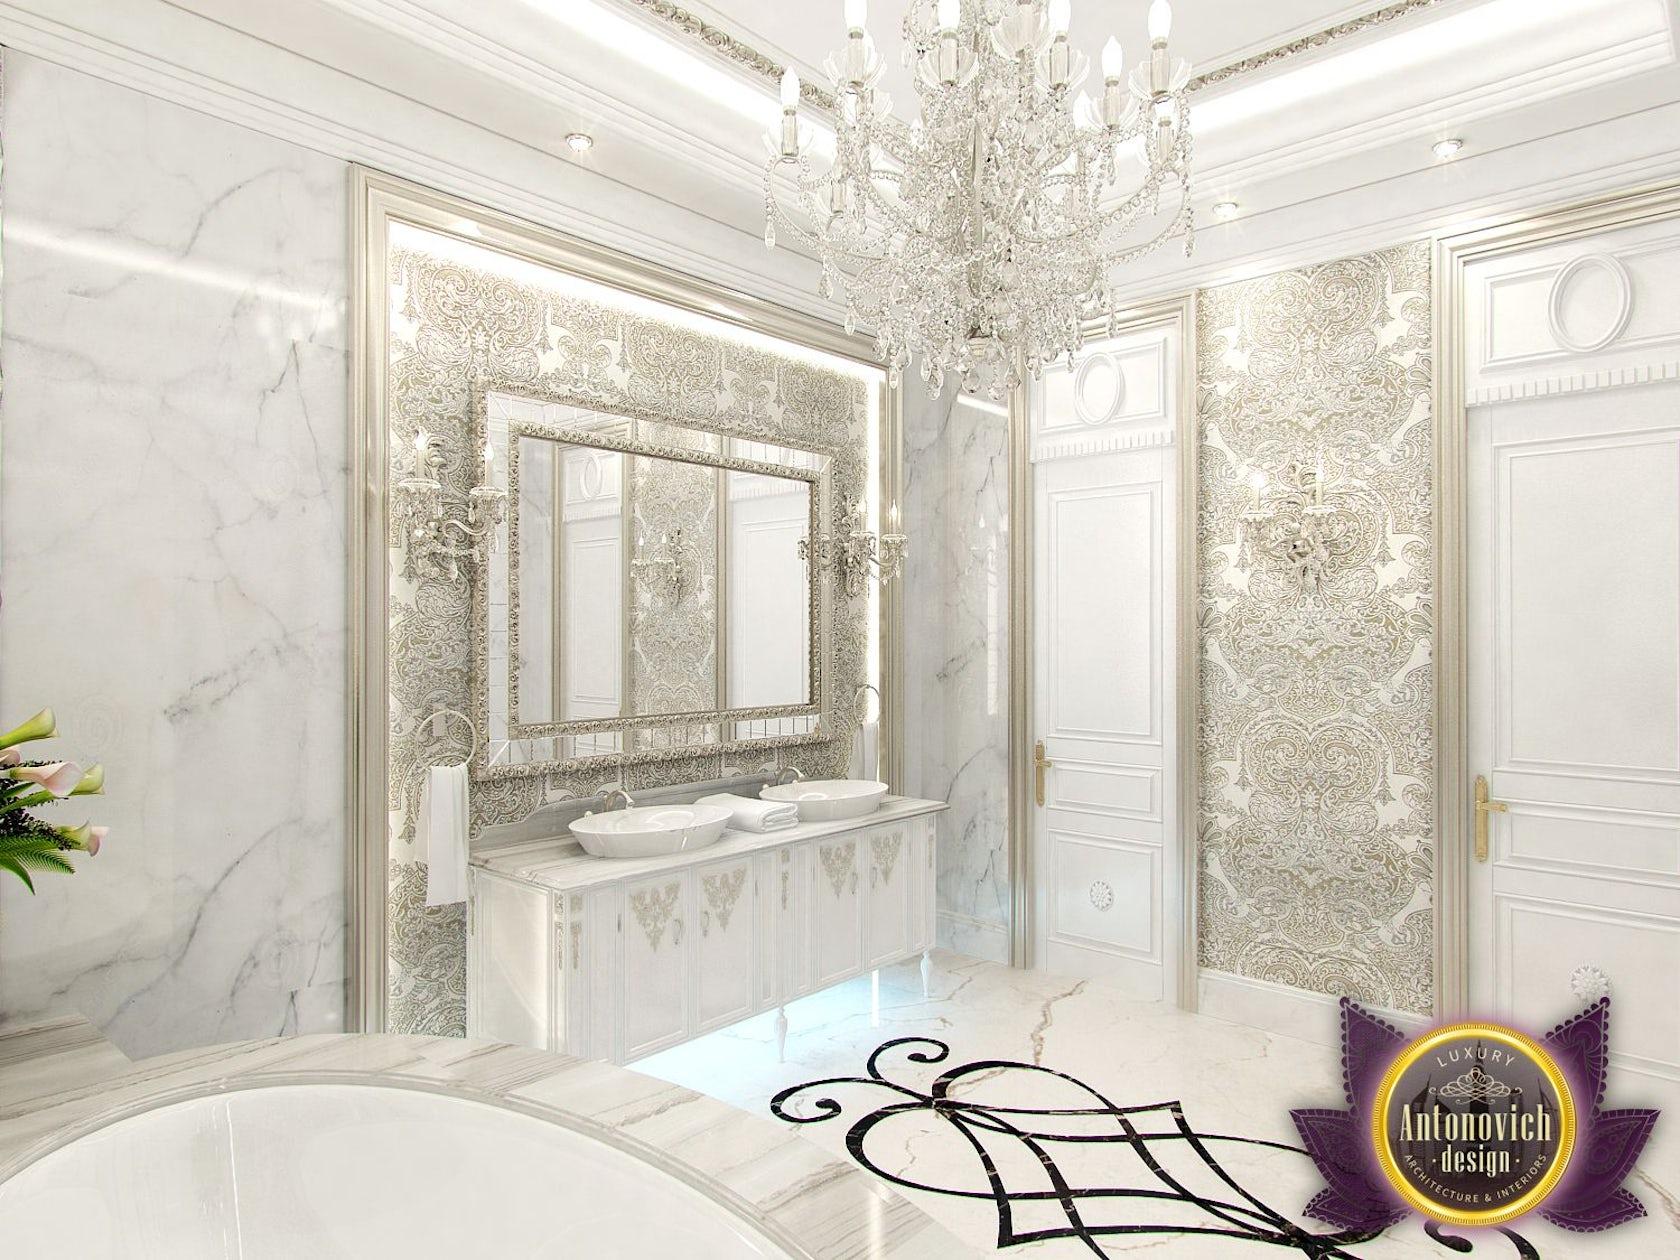 Kitchen Design Usa By Katrina Antonovich: Interior Bathroom From Luxury Antonovich Design